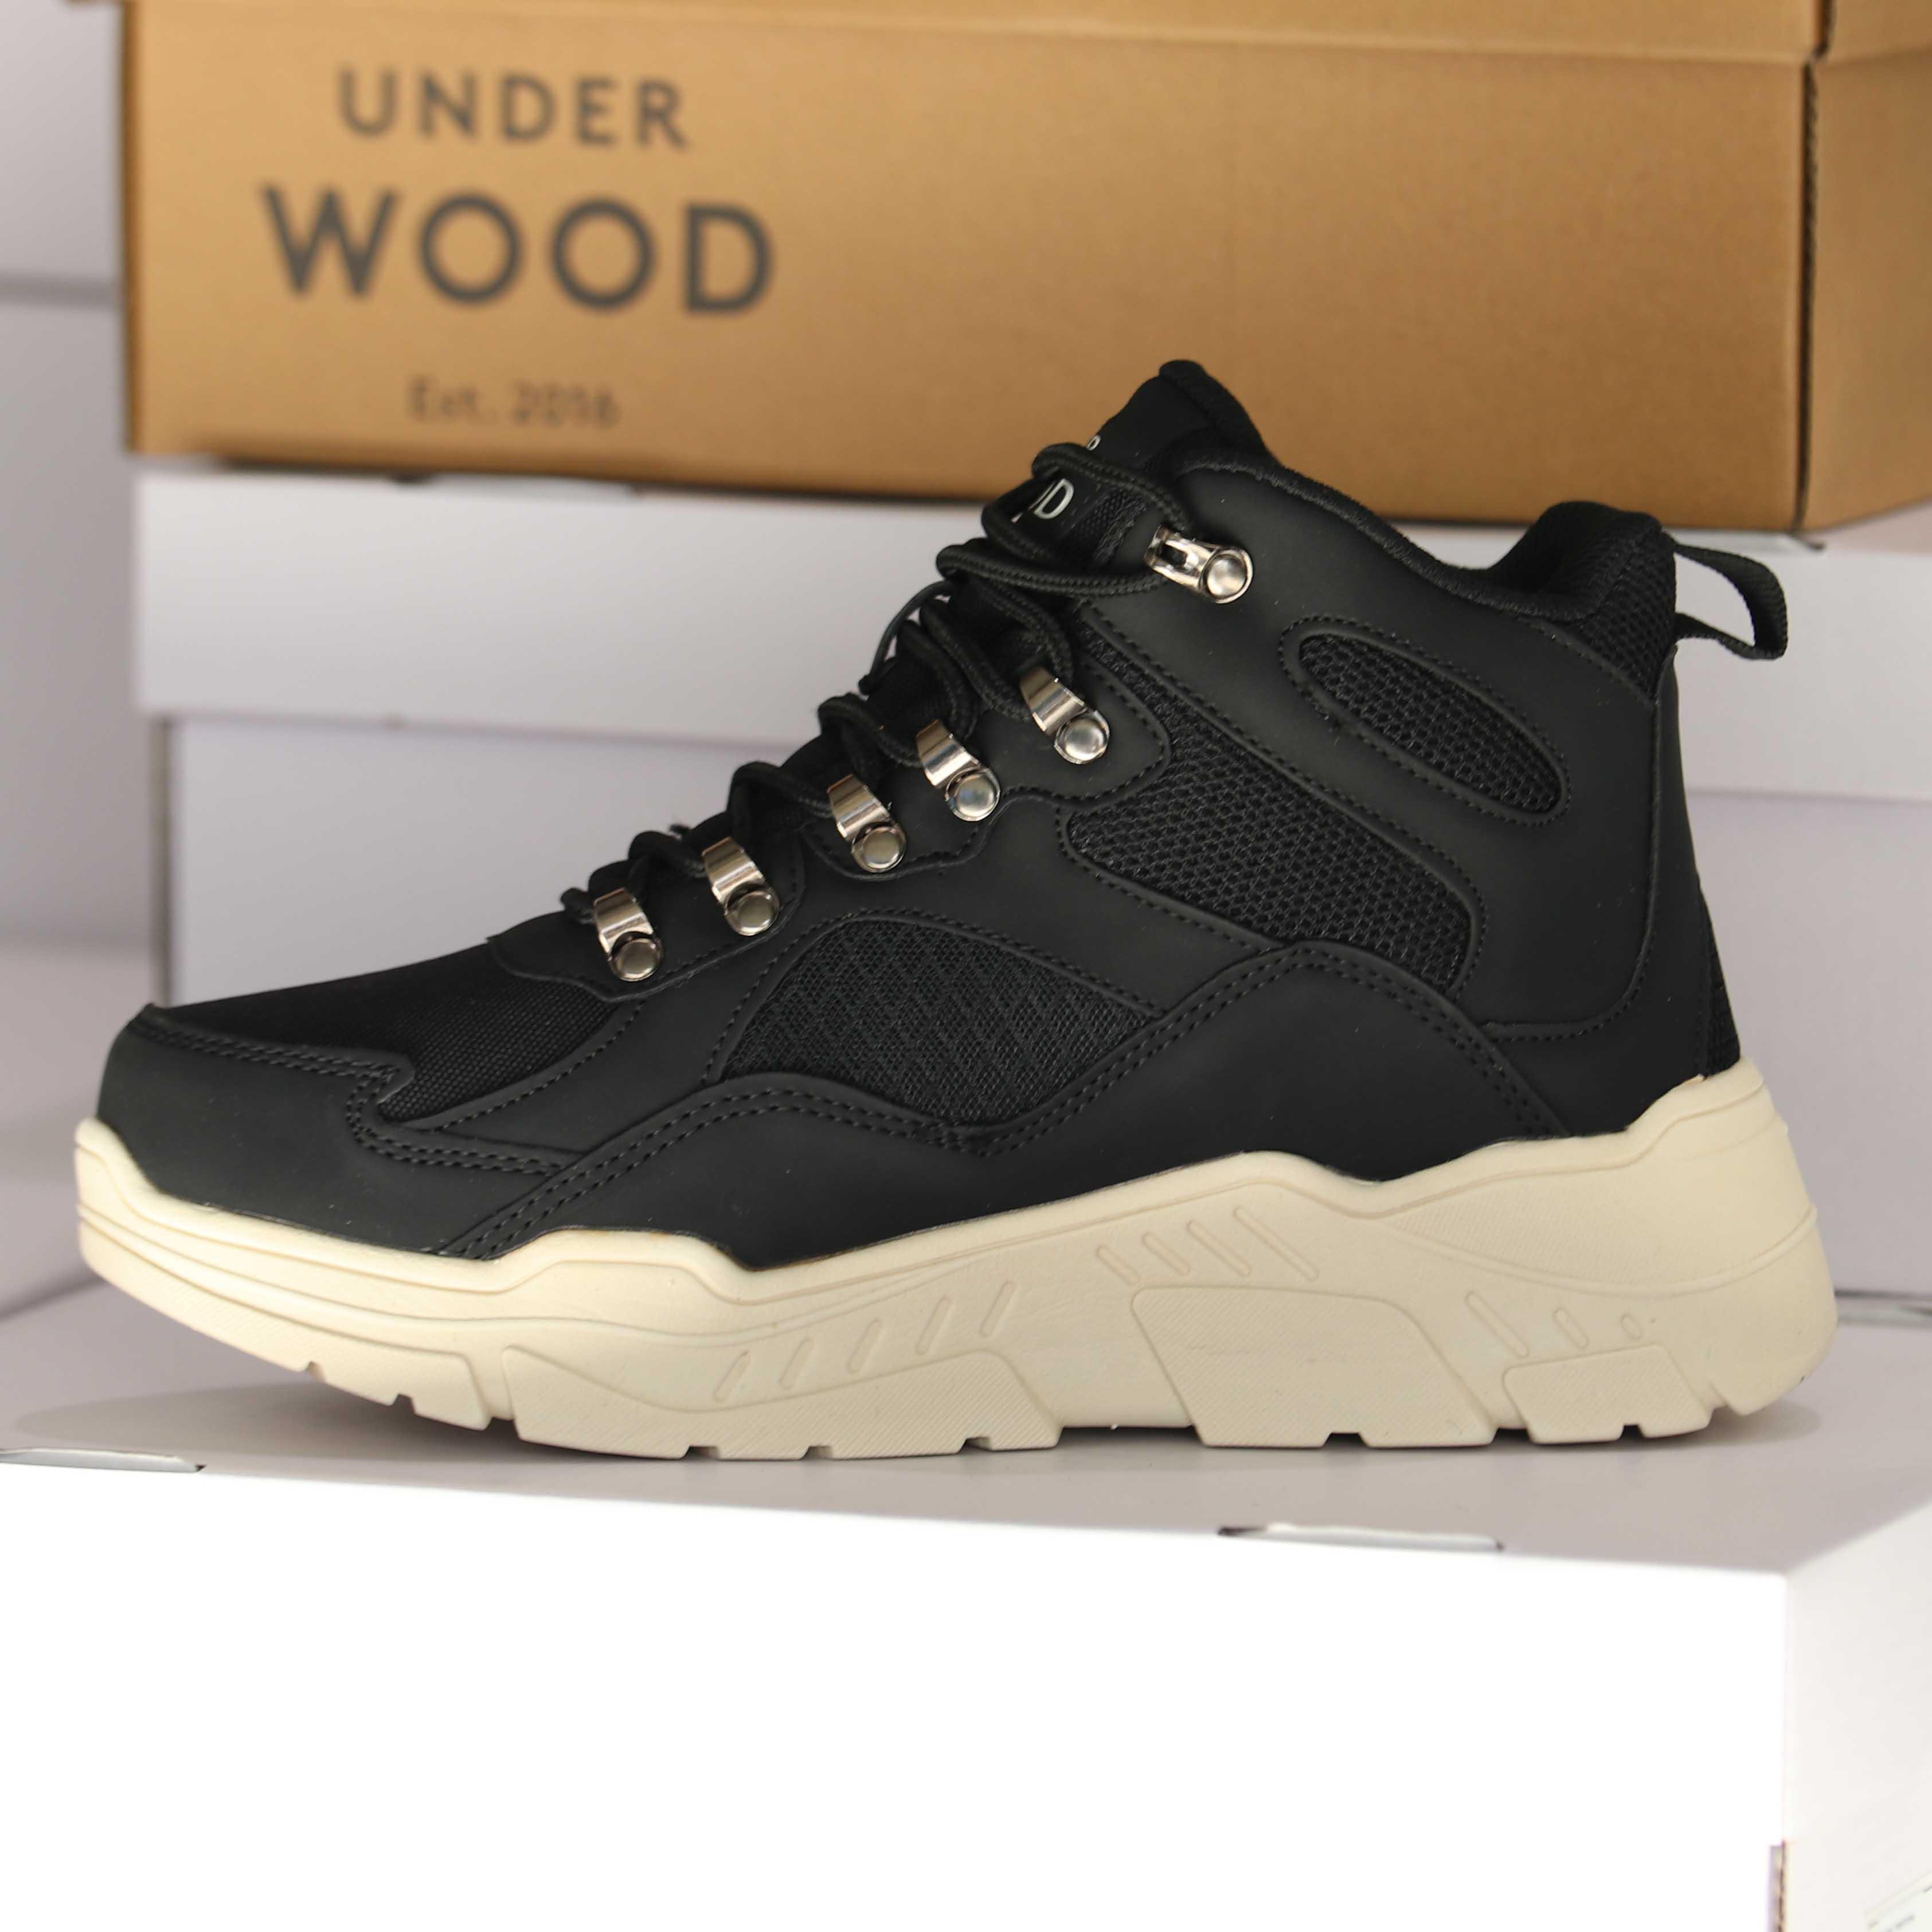 under wood – discovery black 25838 dame sko 2